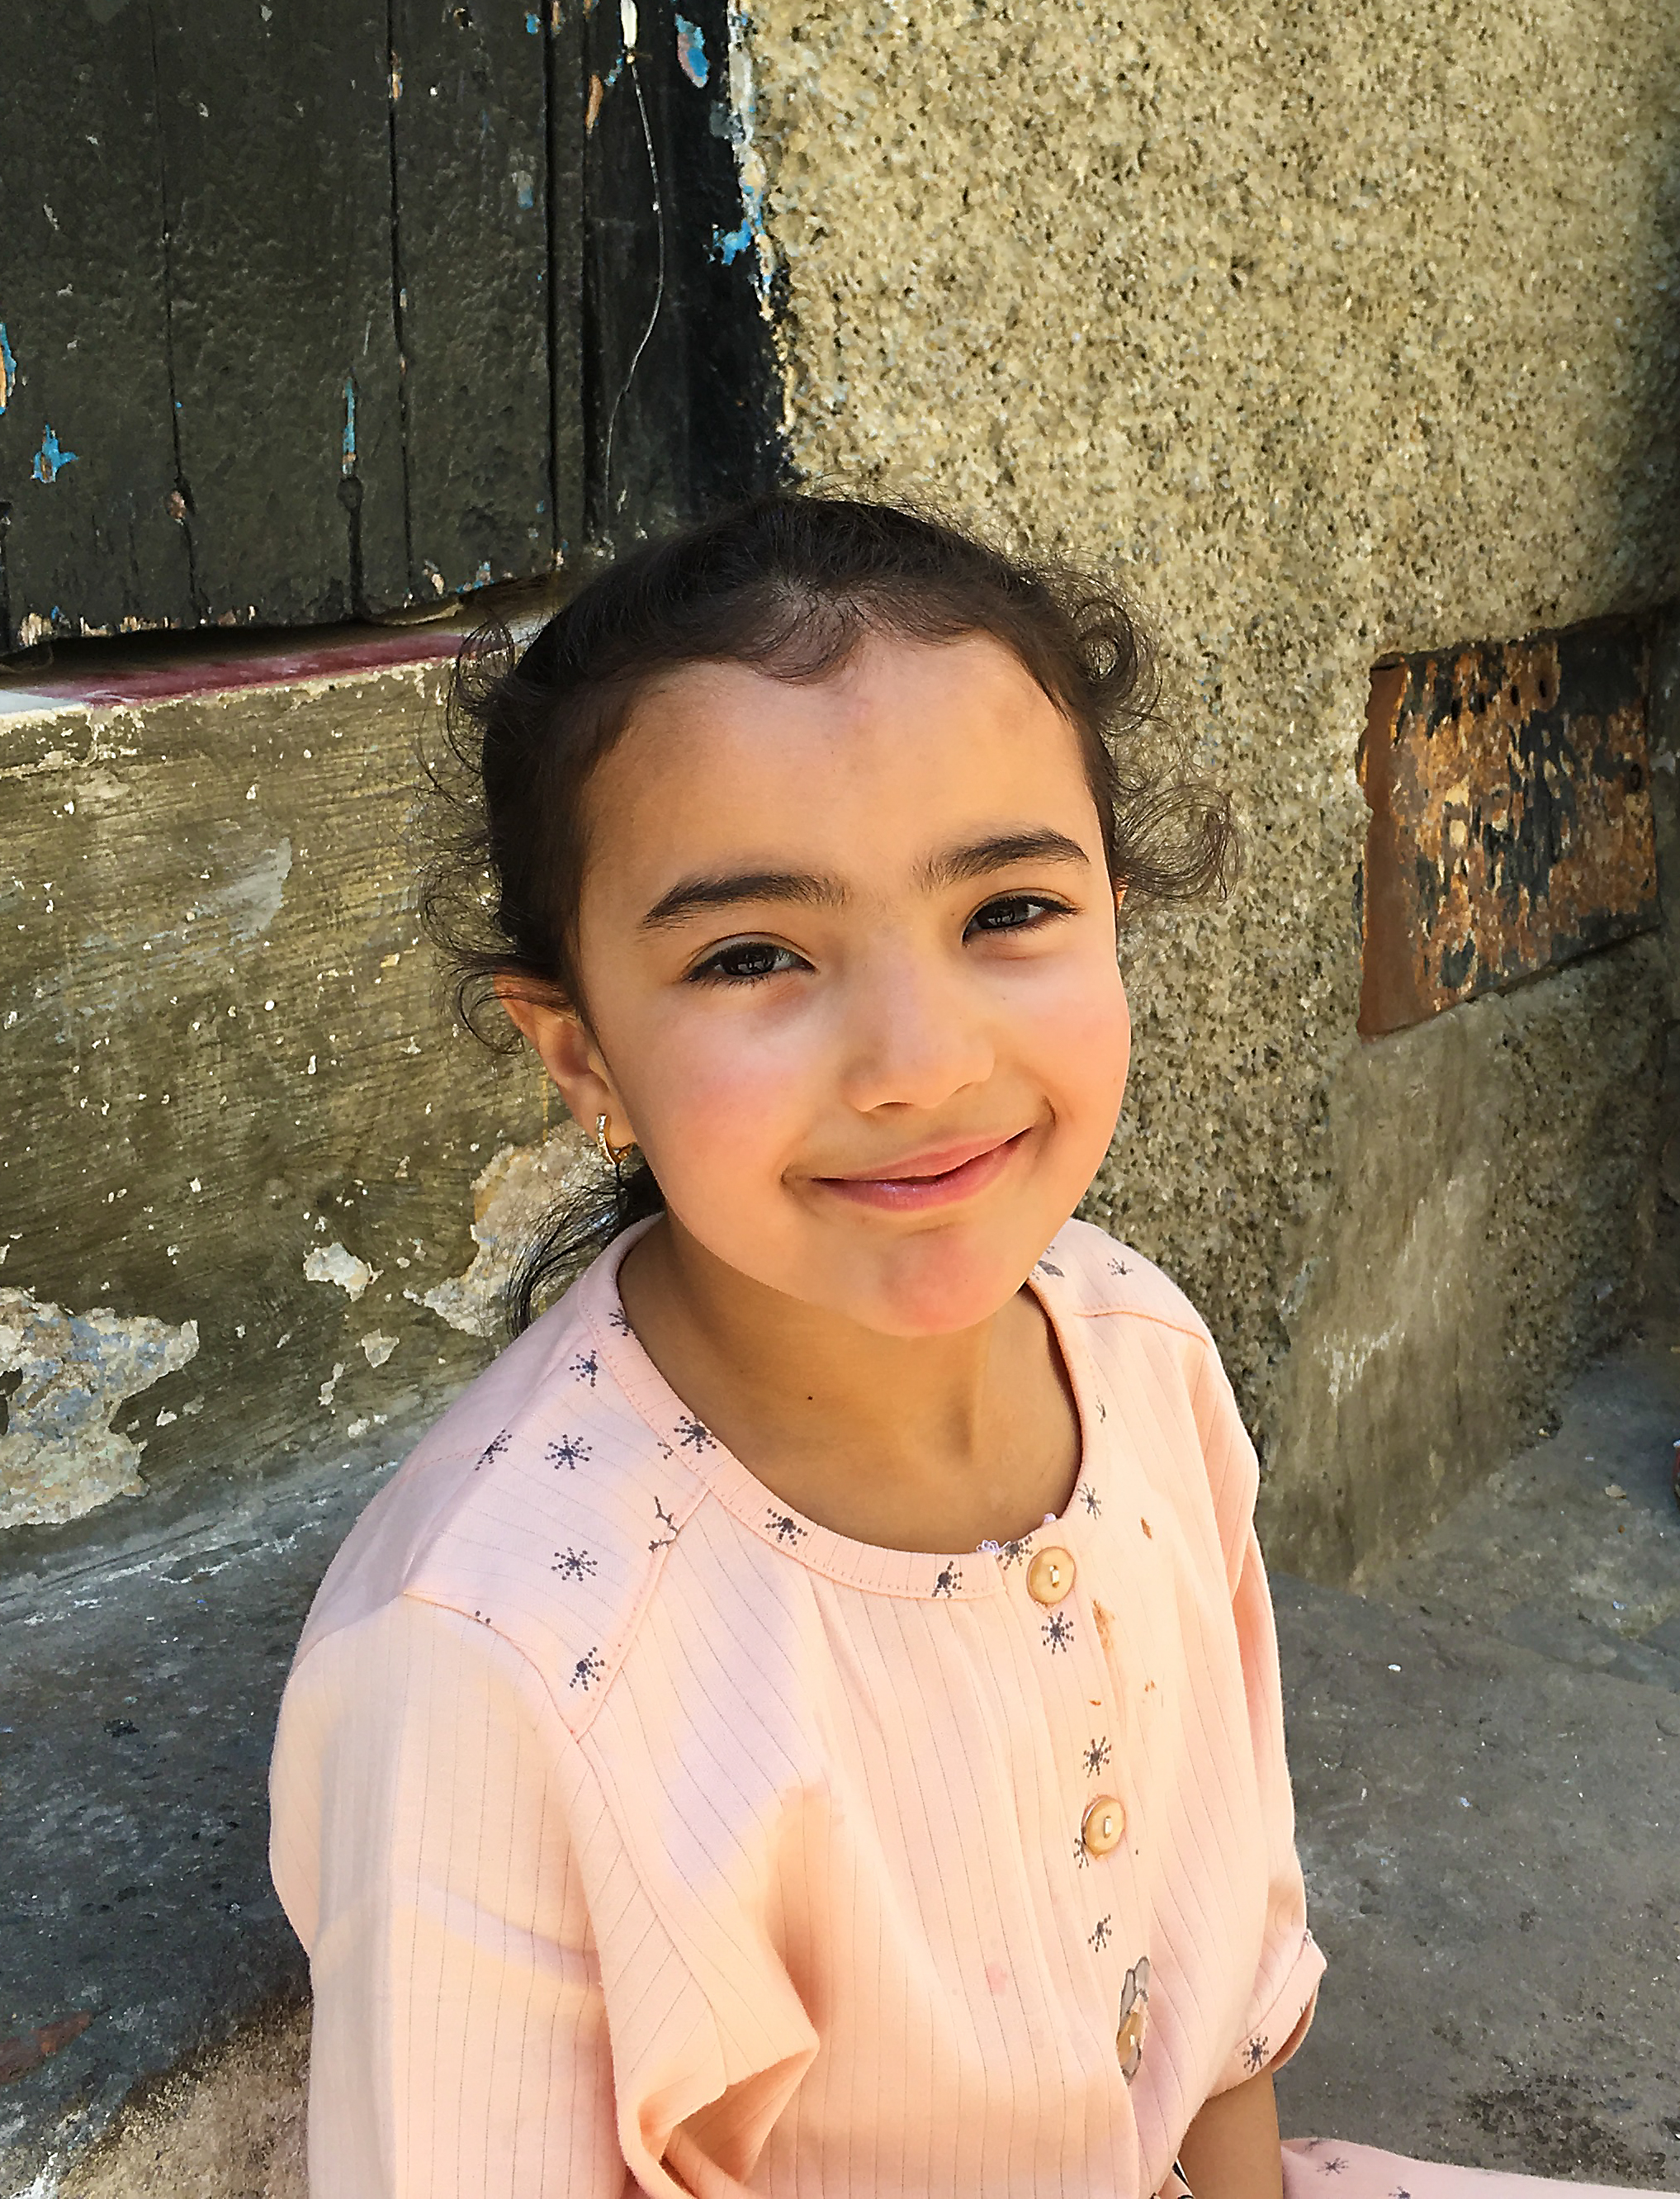 Tangier girl2